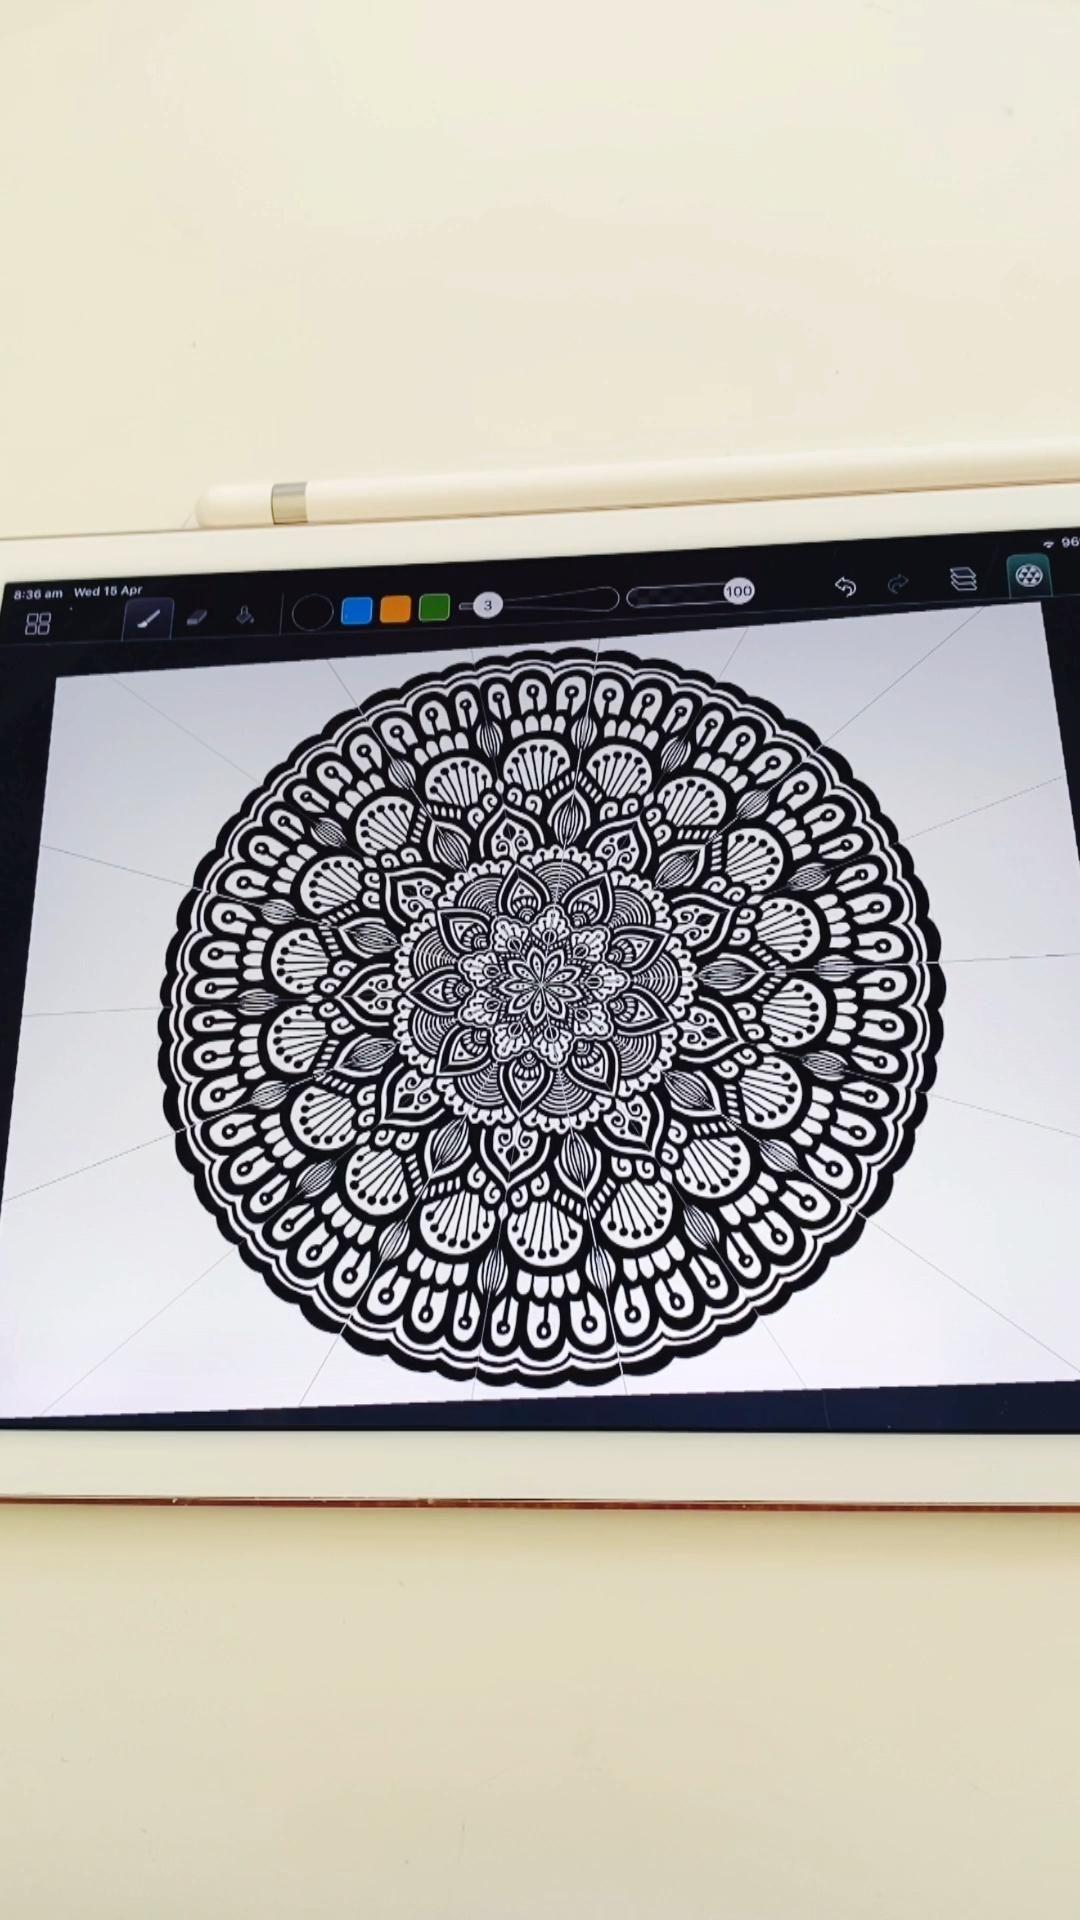 Digital Mandala Art Tutorial Art Digital Mandala Create Videotutorial Mandala Kunst Mandala Kunstunterricht Anleitung Fur Digitale Kunst